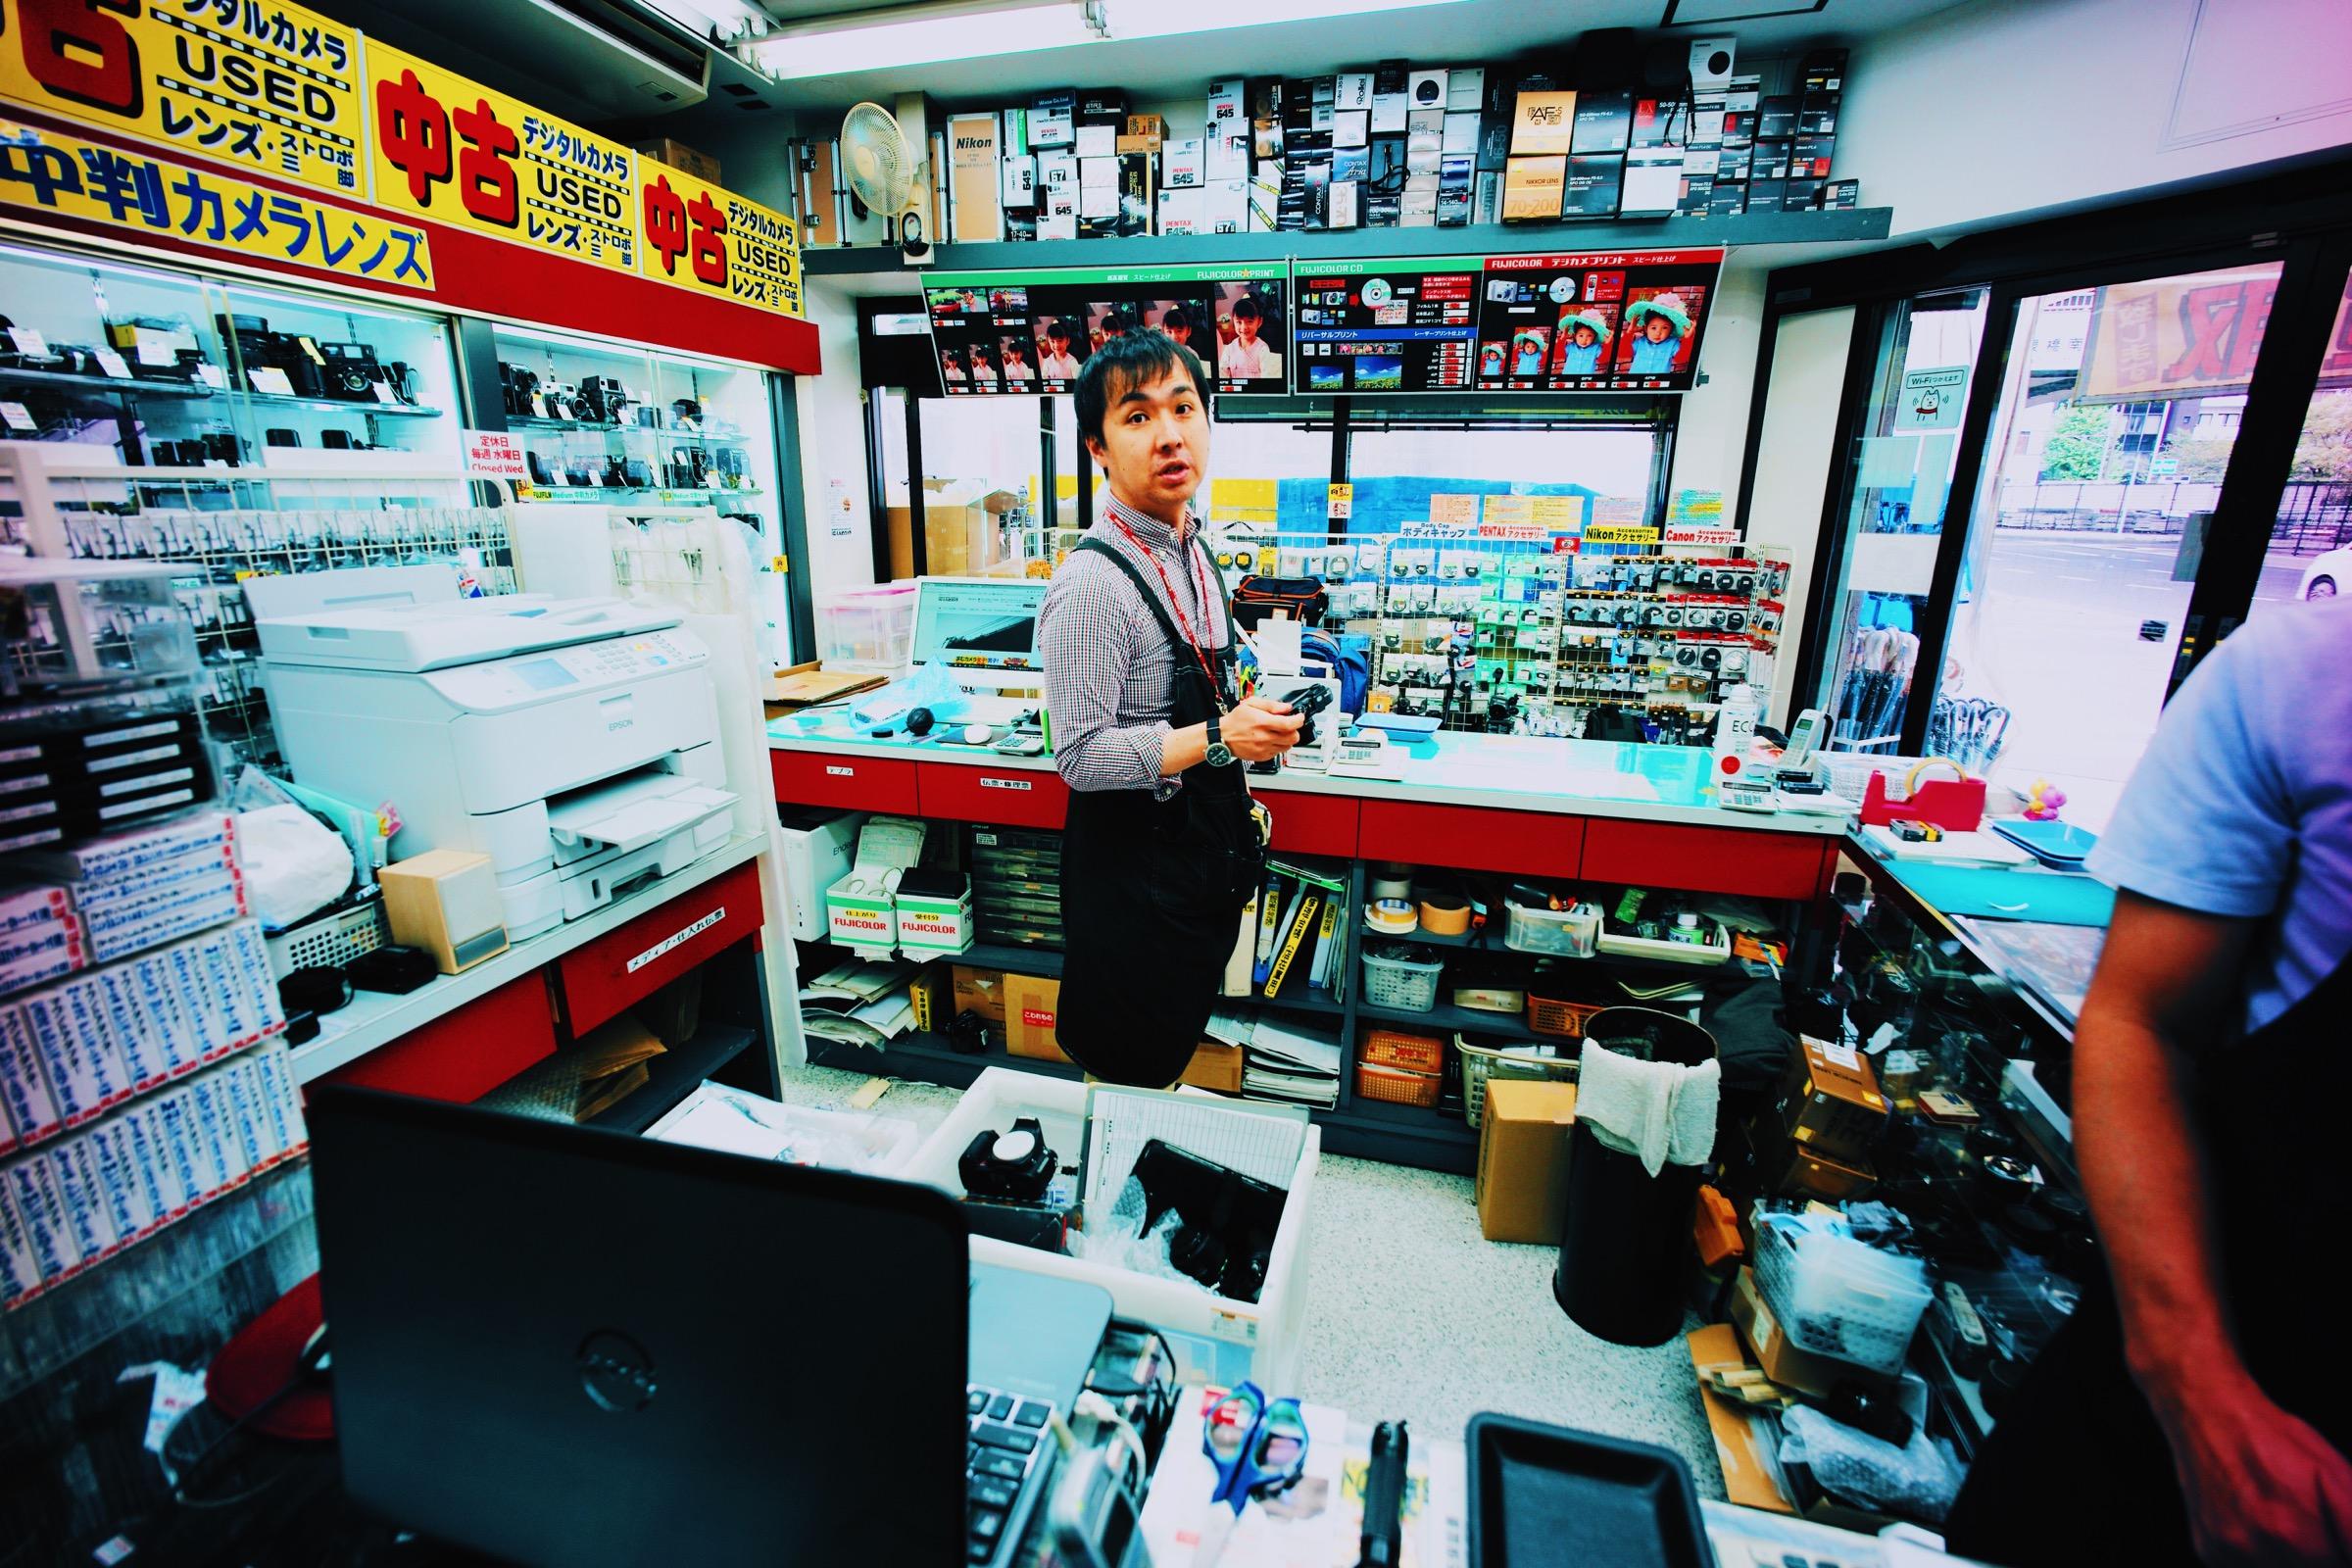 Japan camera shop